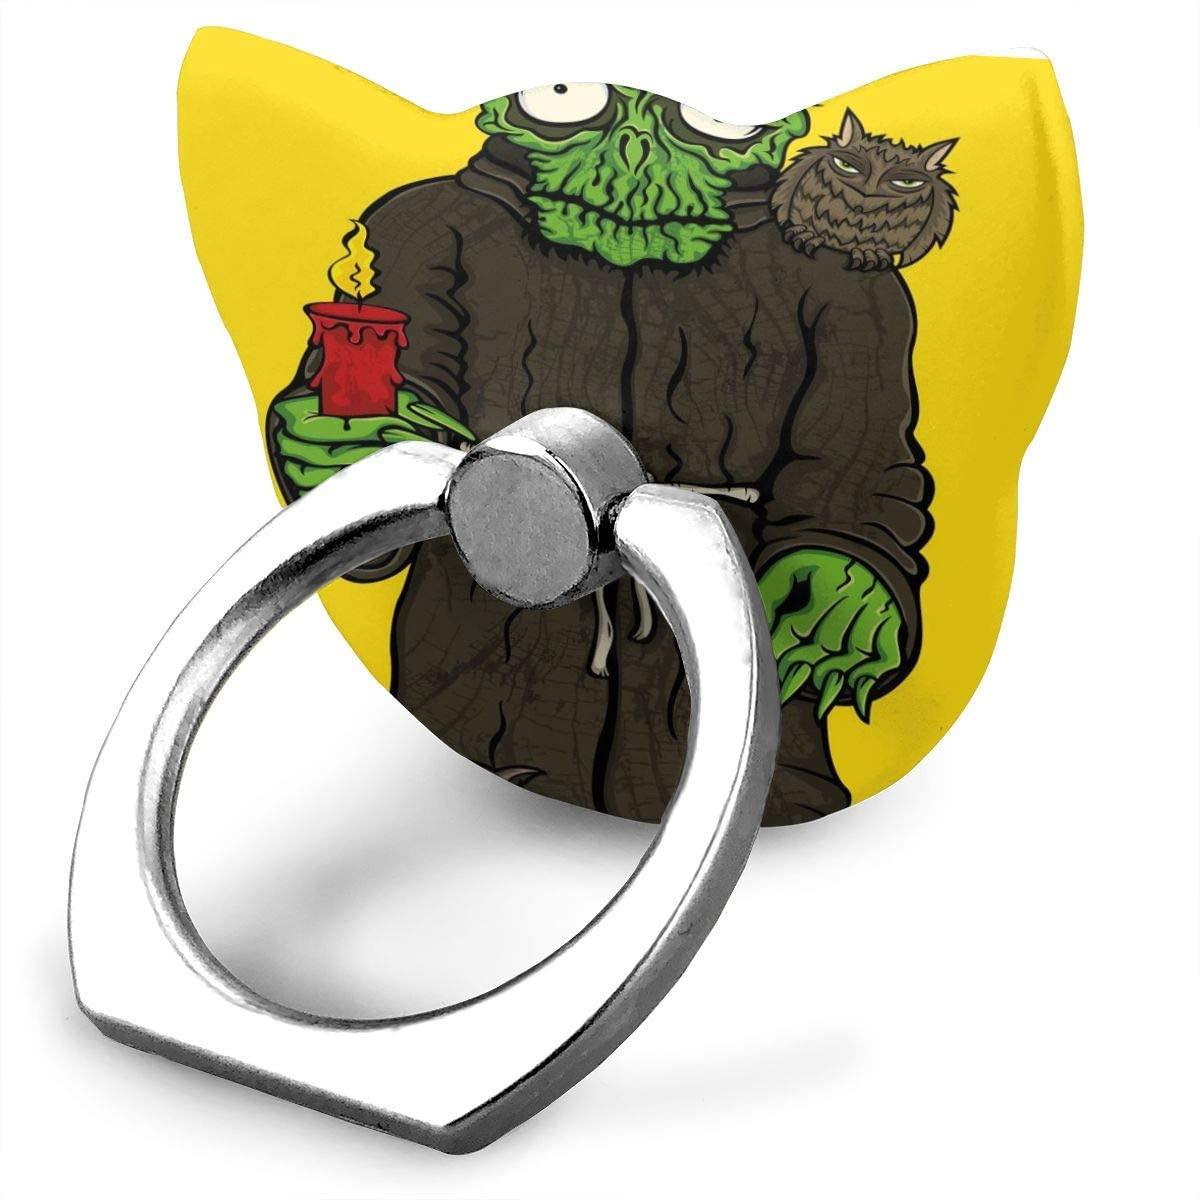 Universal Phone Ring Holder Halloween Horror Monk In Robe Monster Skull Cat Shape Cell Phone Ring Stand Adjustable Finger Kickstand Grip-Silver Mobile Phone Stand For Women Kids Men Ladies Smartphones